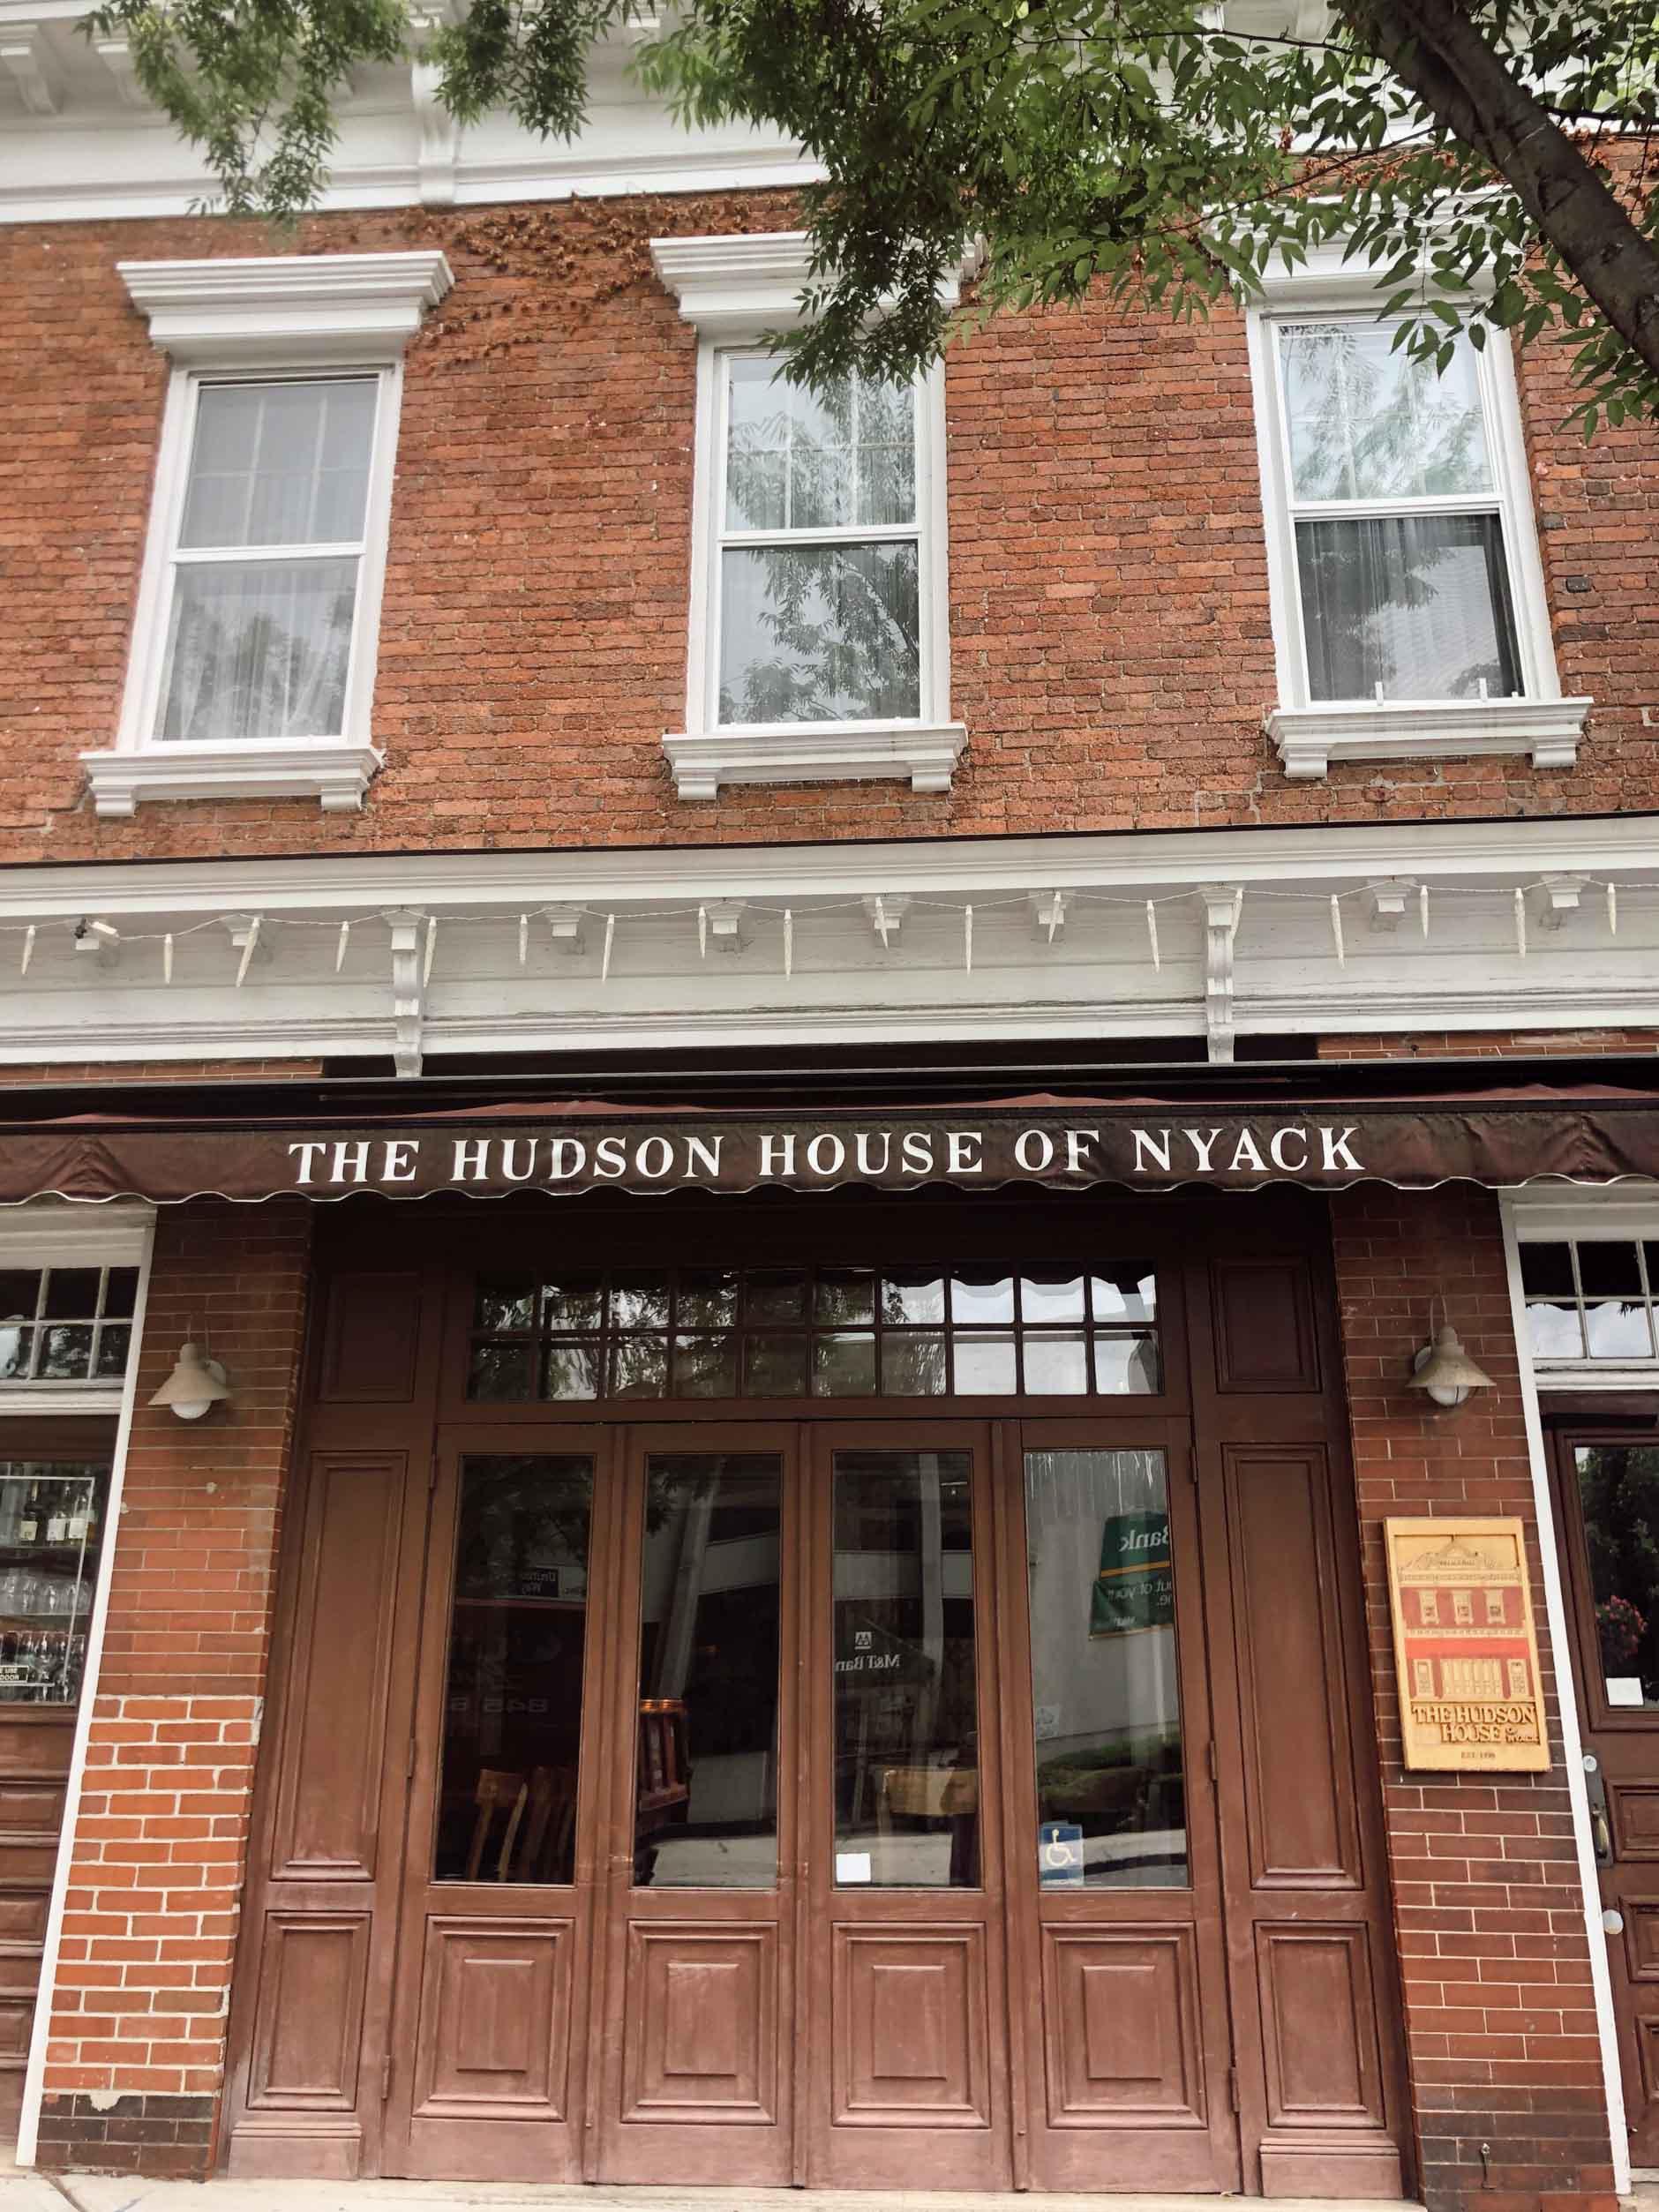 hudson house downtown yack